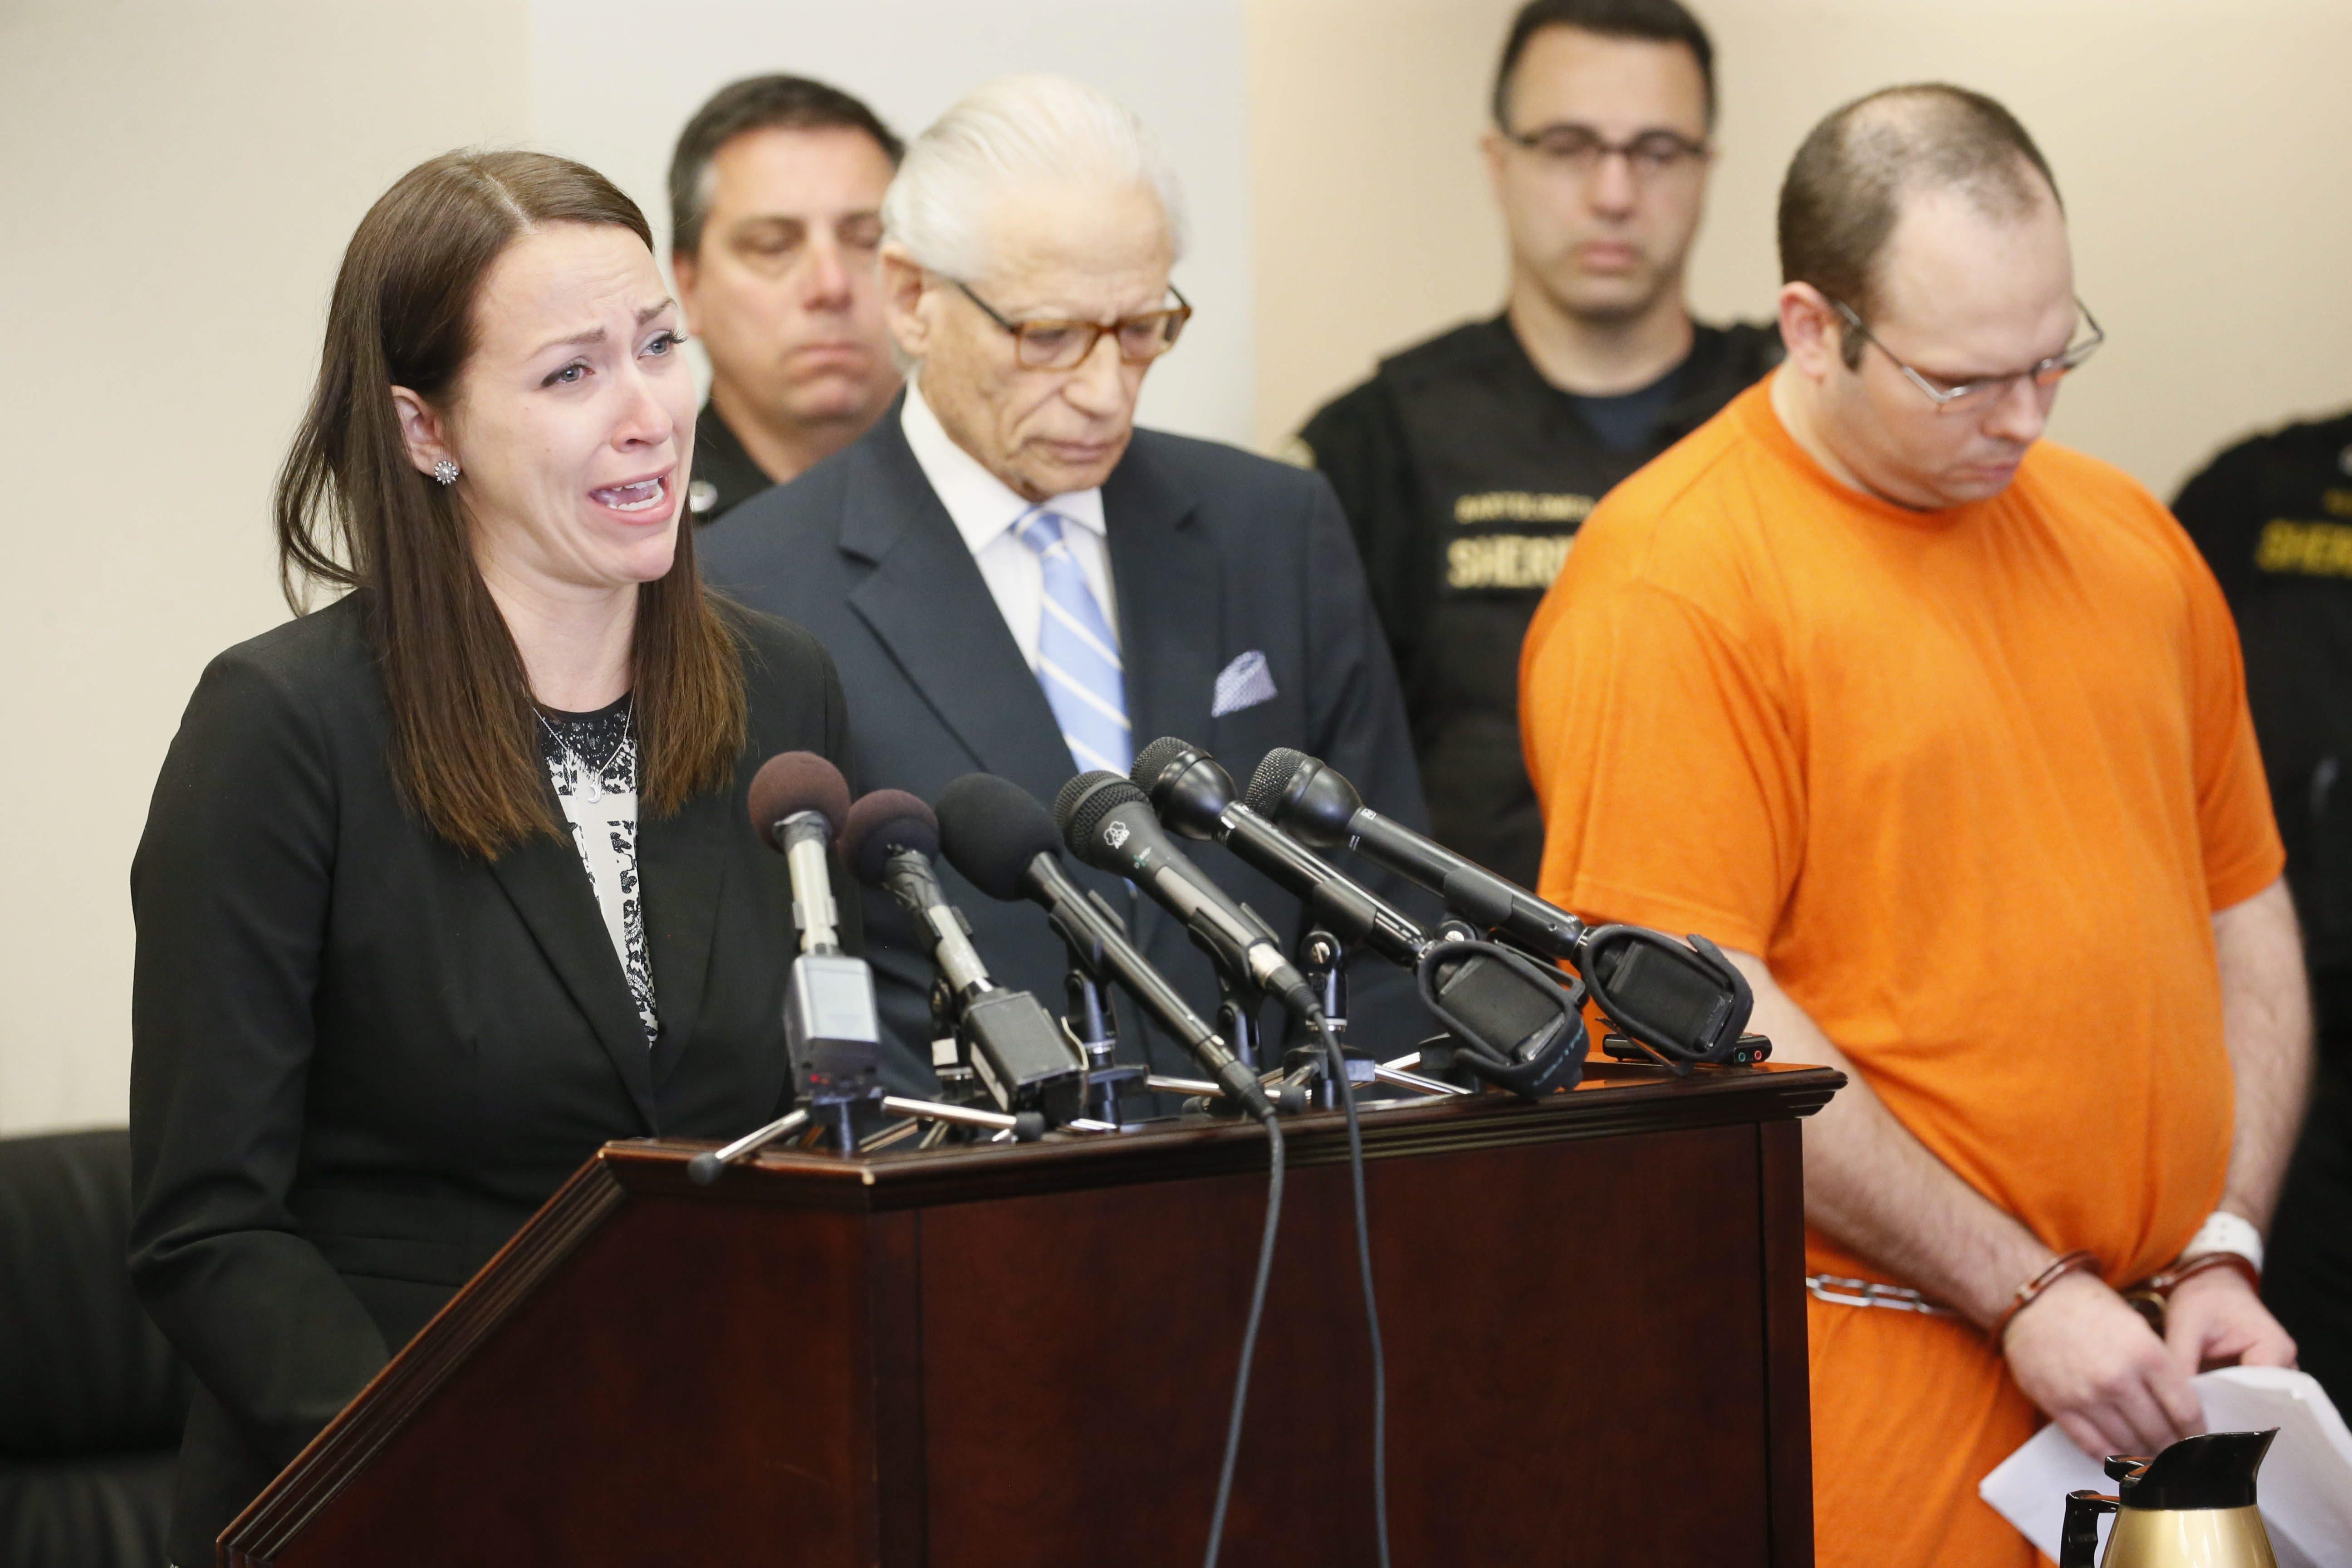 Erika Webster, fiancée of Molly's Pub homicide victim William C. Sager Jr., addresses the court, with defense attorney Joel L. Daniels and Jeffrey J. Basil alongside.